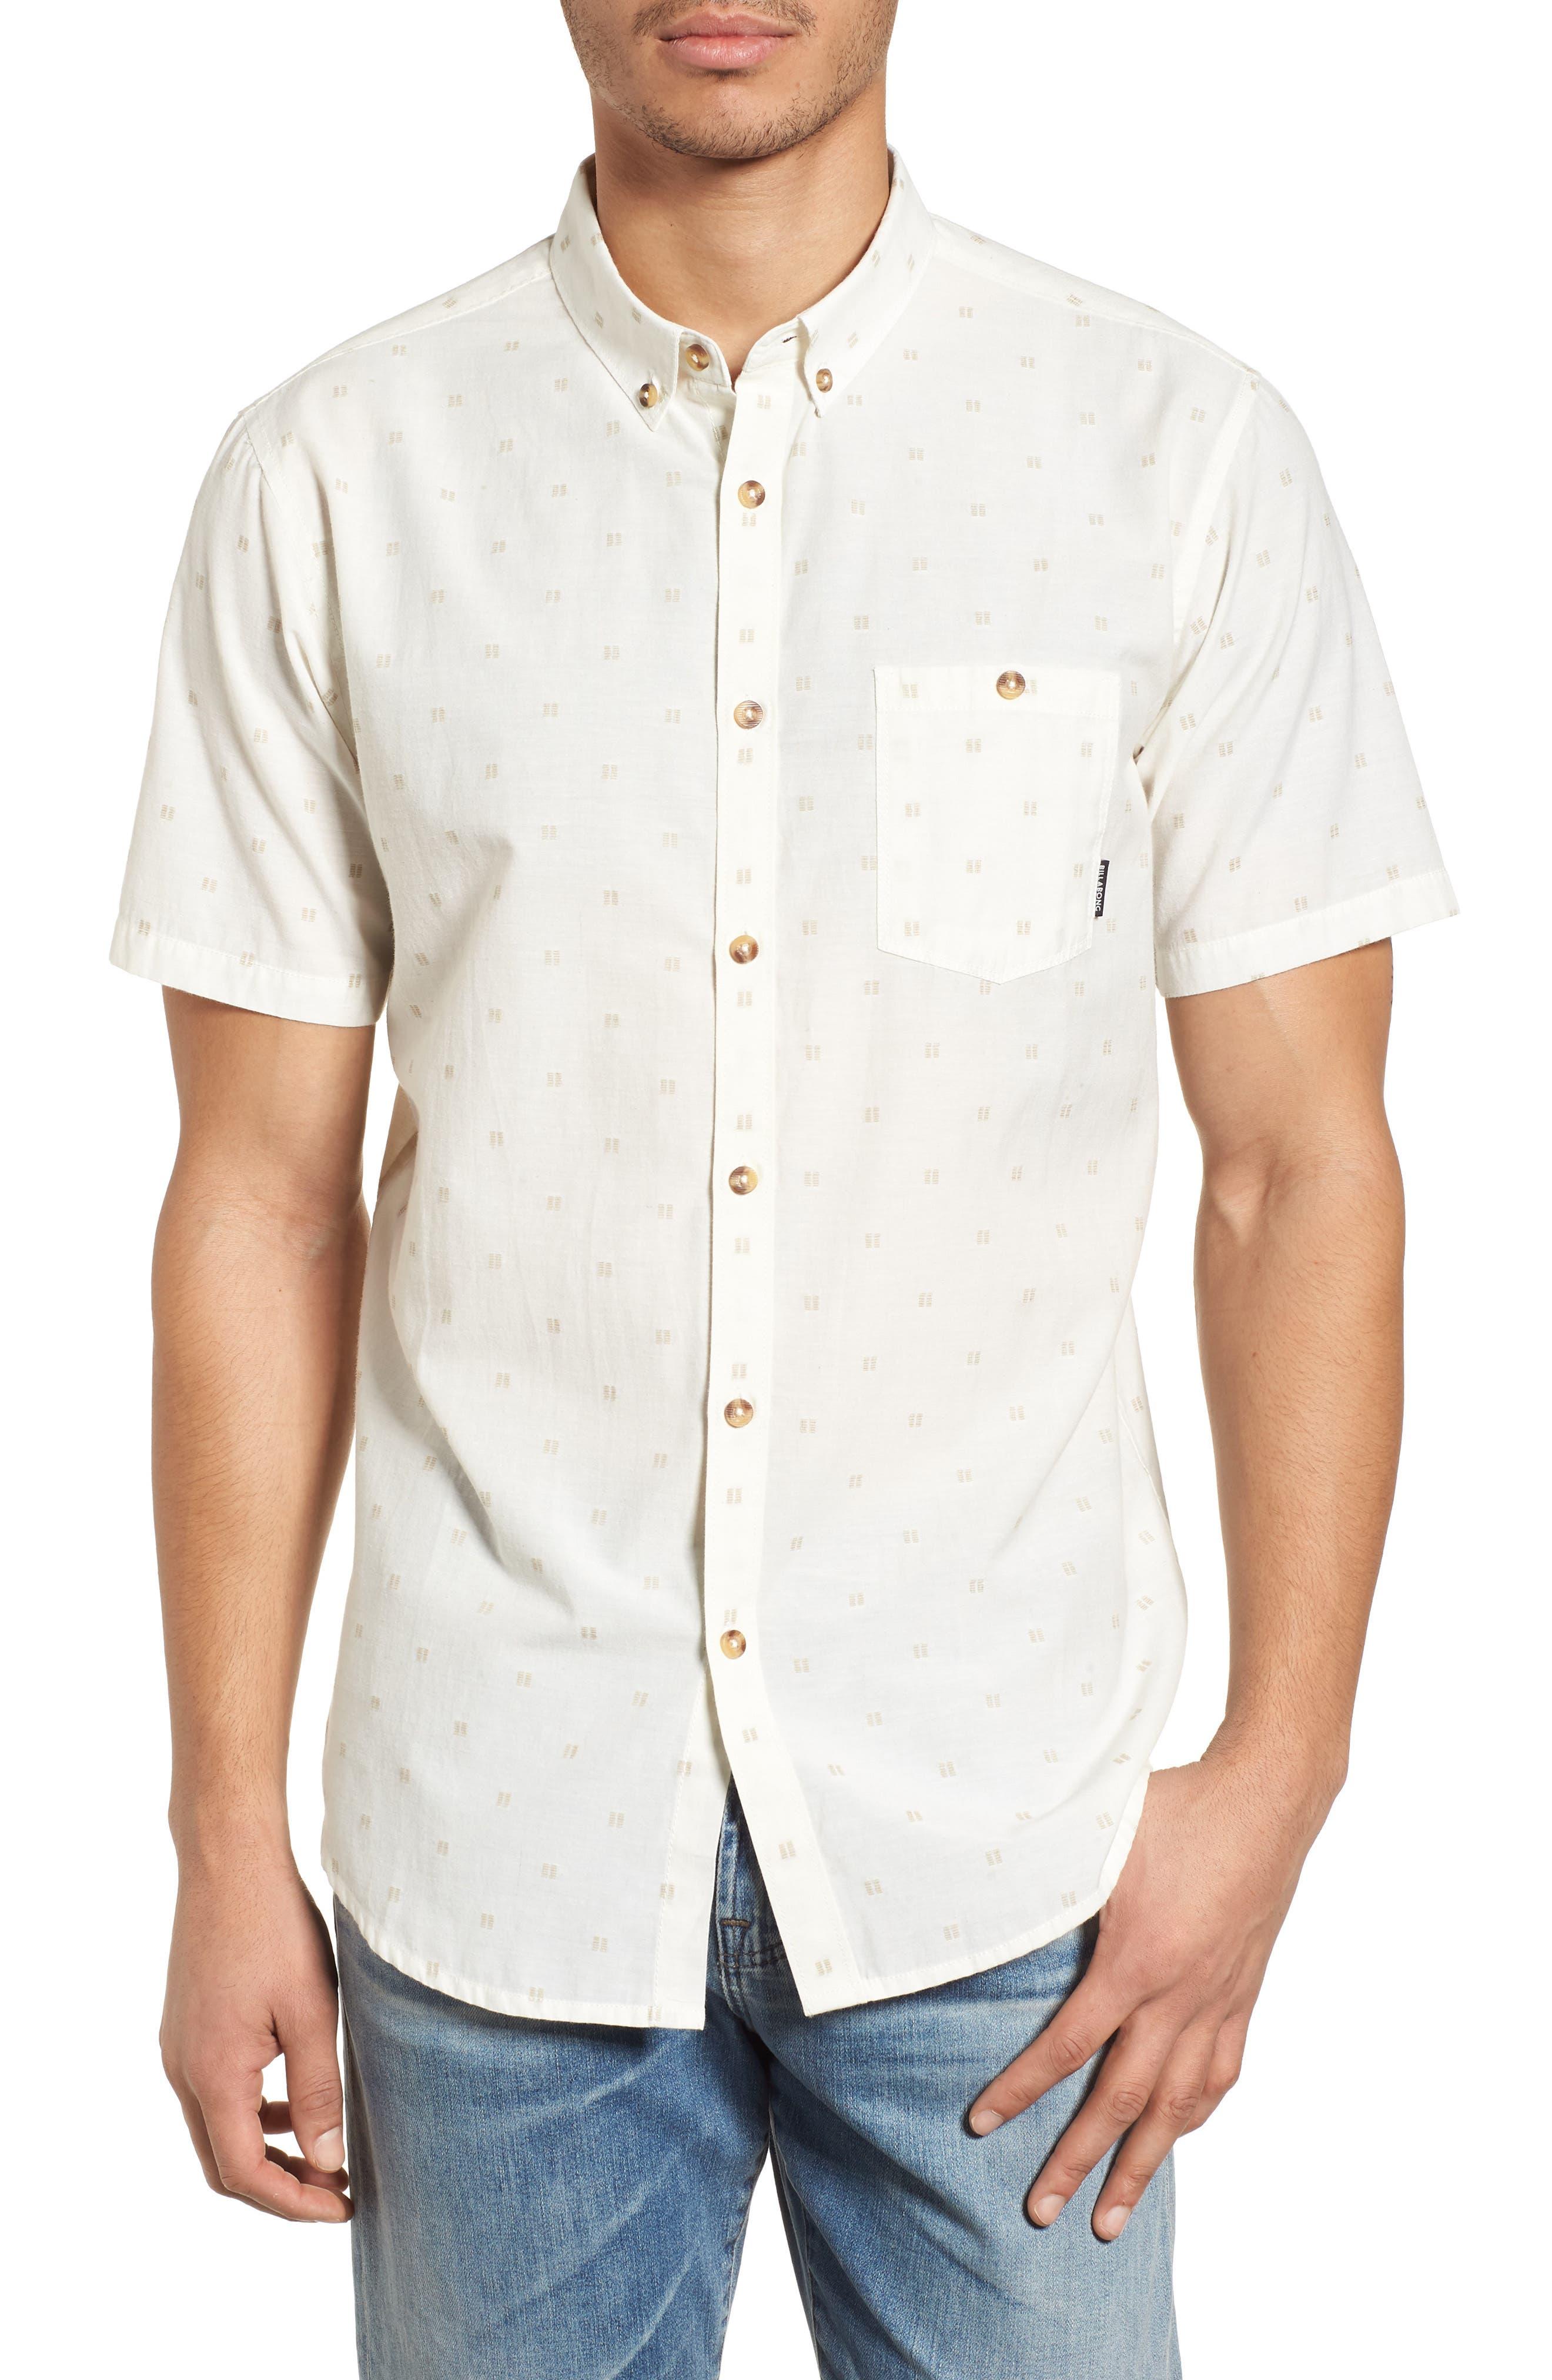 All Day Jacquard Shirt,                         Main,                         color, Rock